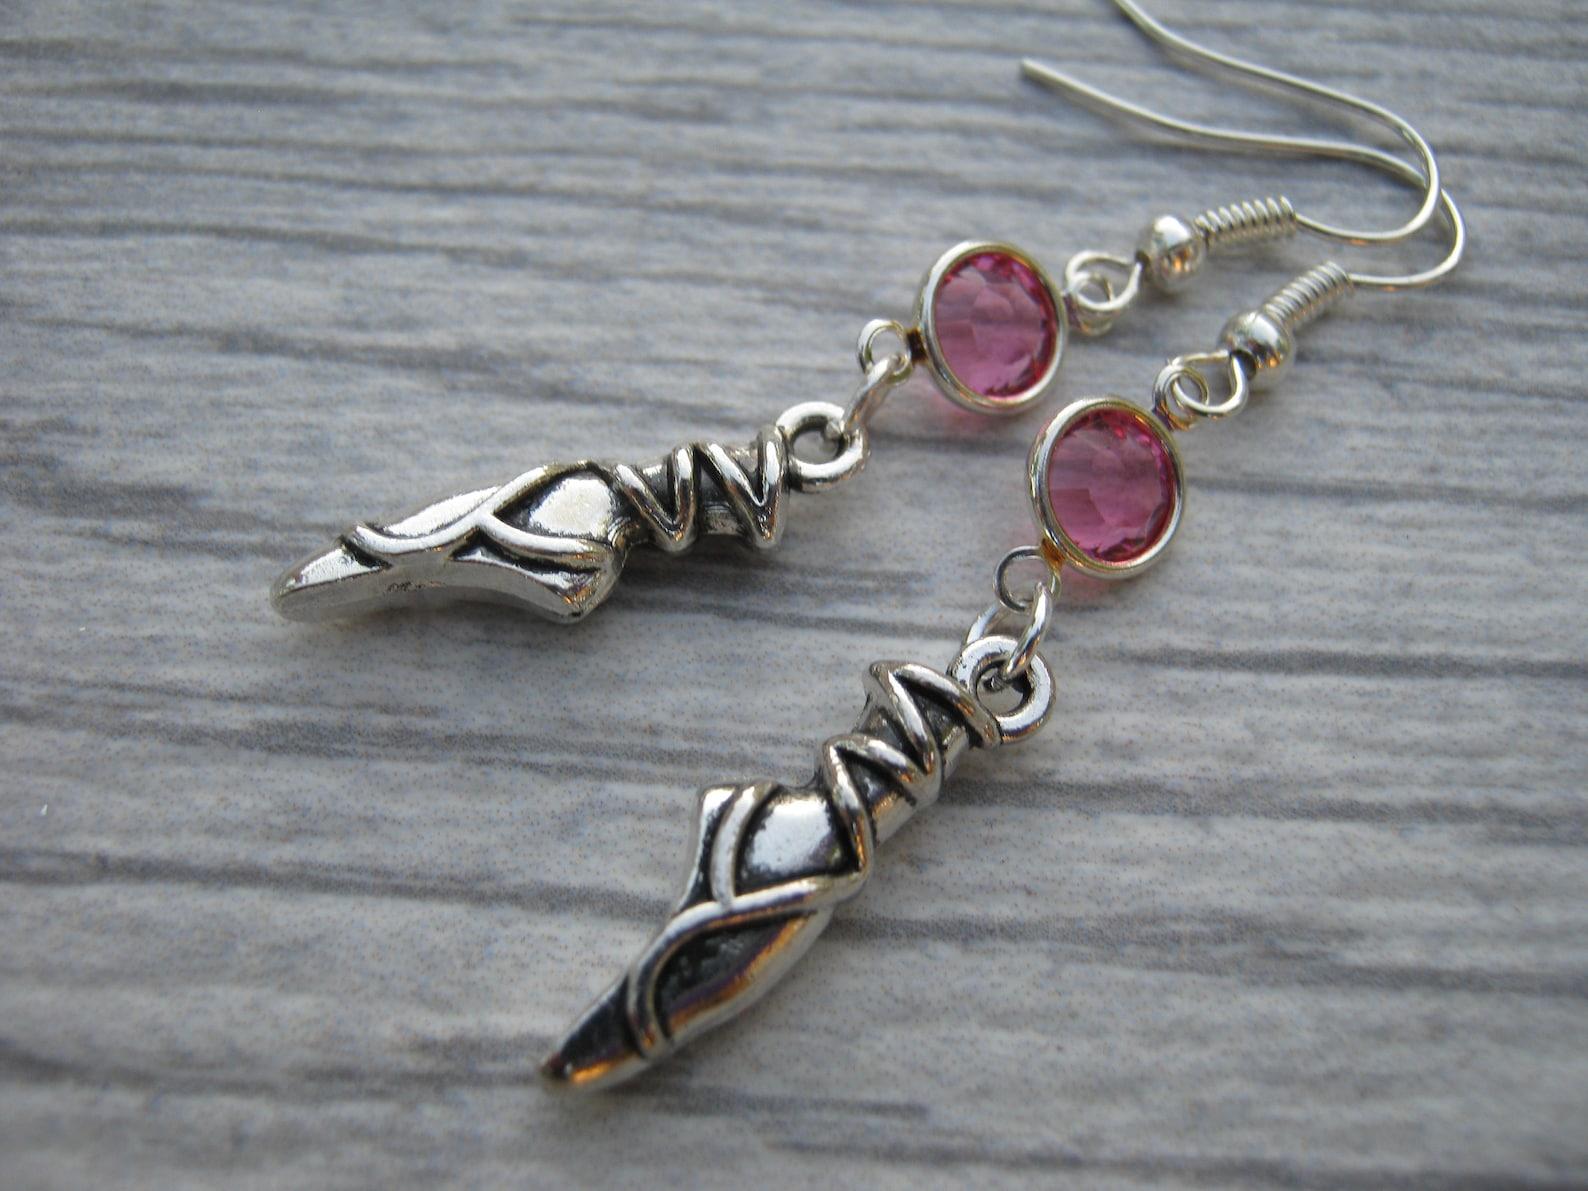 ballet shoes birthstone earrings, personalized ballet earrings, ballerina earrings, athletic jewelry, dance jewelry, ballet mom